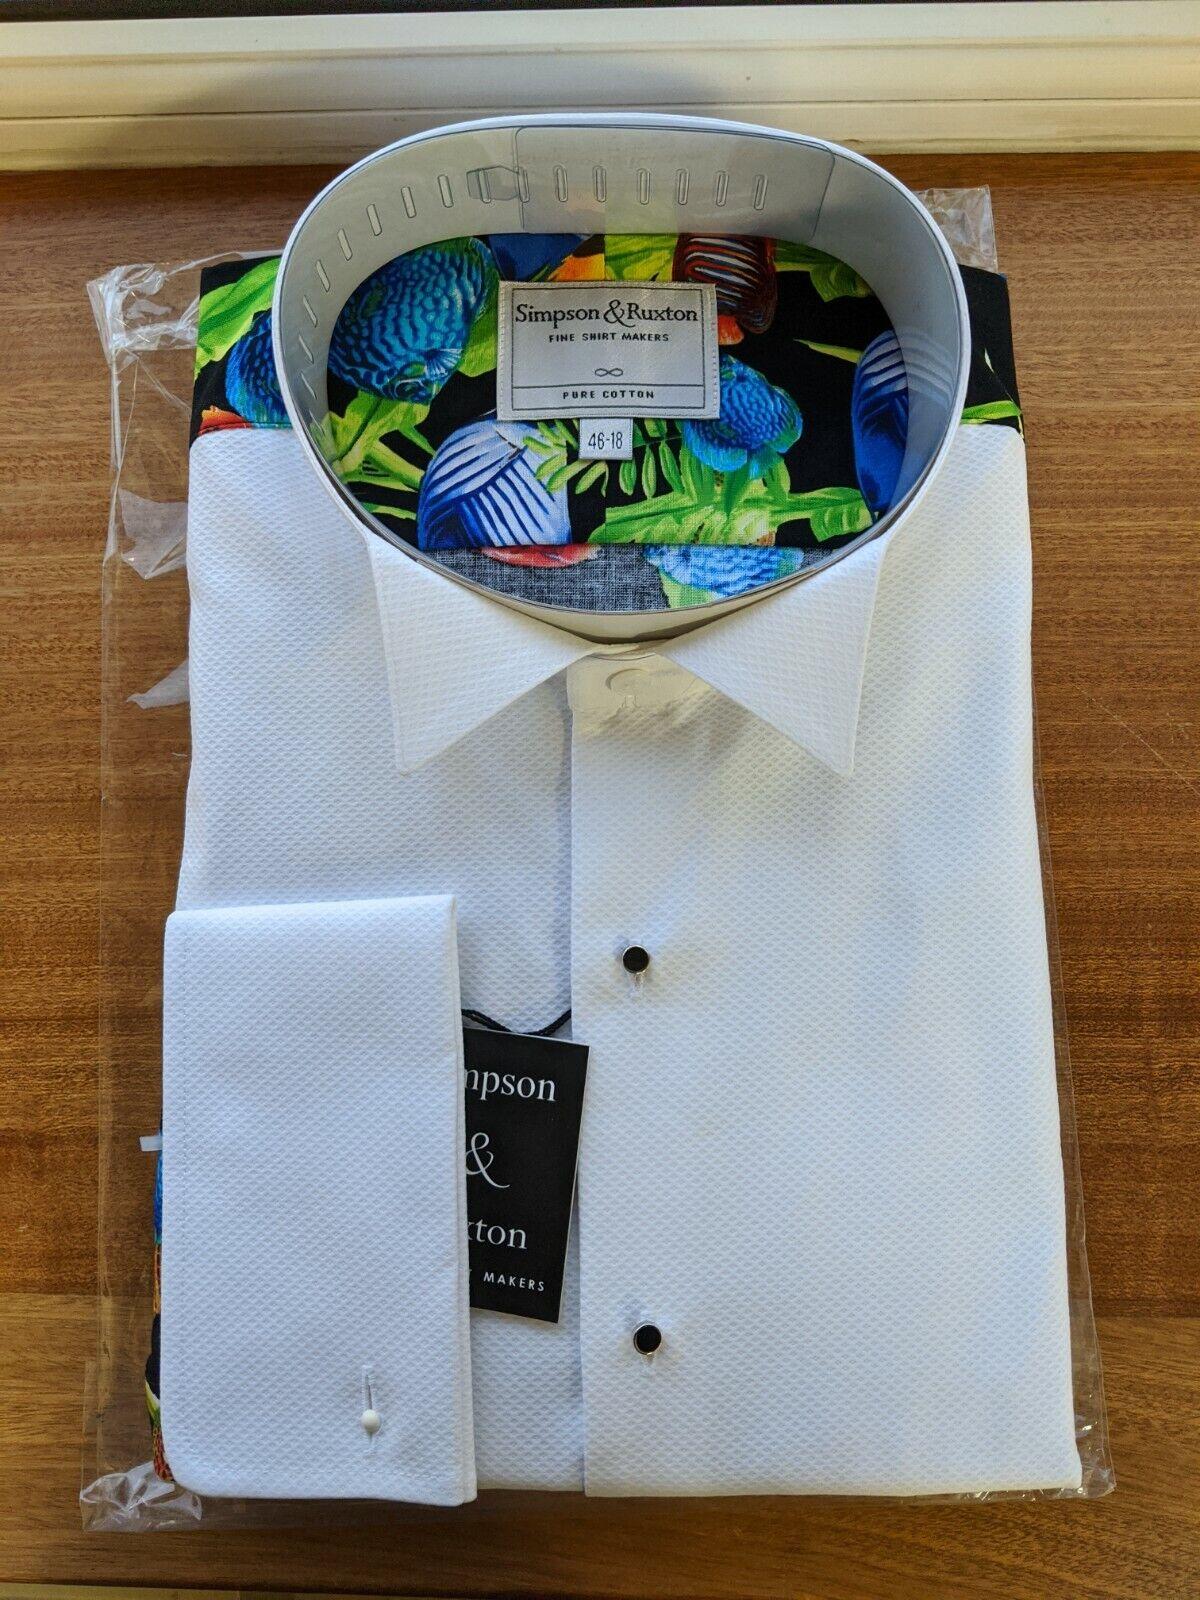 Simpson & Ruxton Wing Collar Fish Luxury Fancy Party Evening Dress Shirt